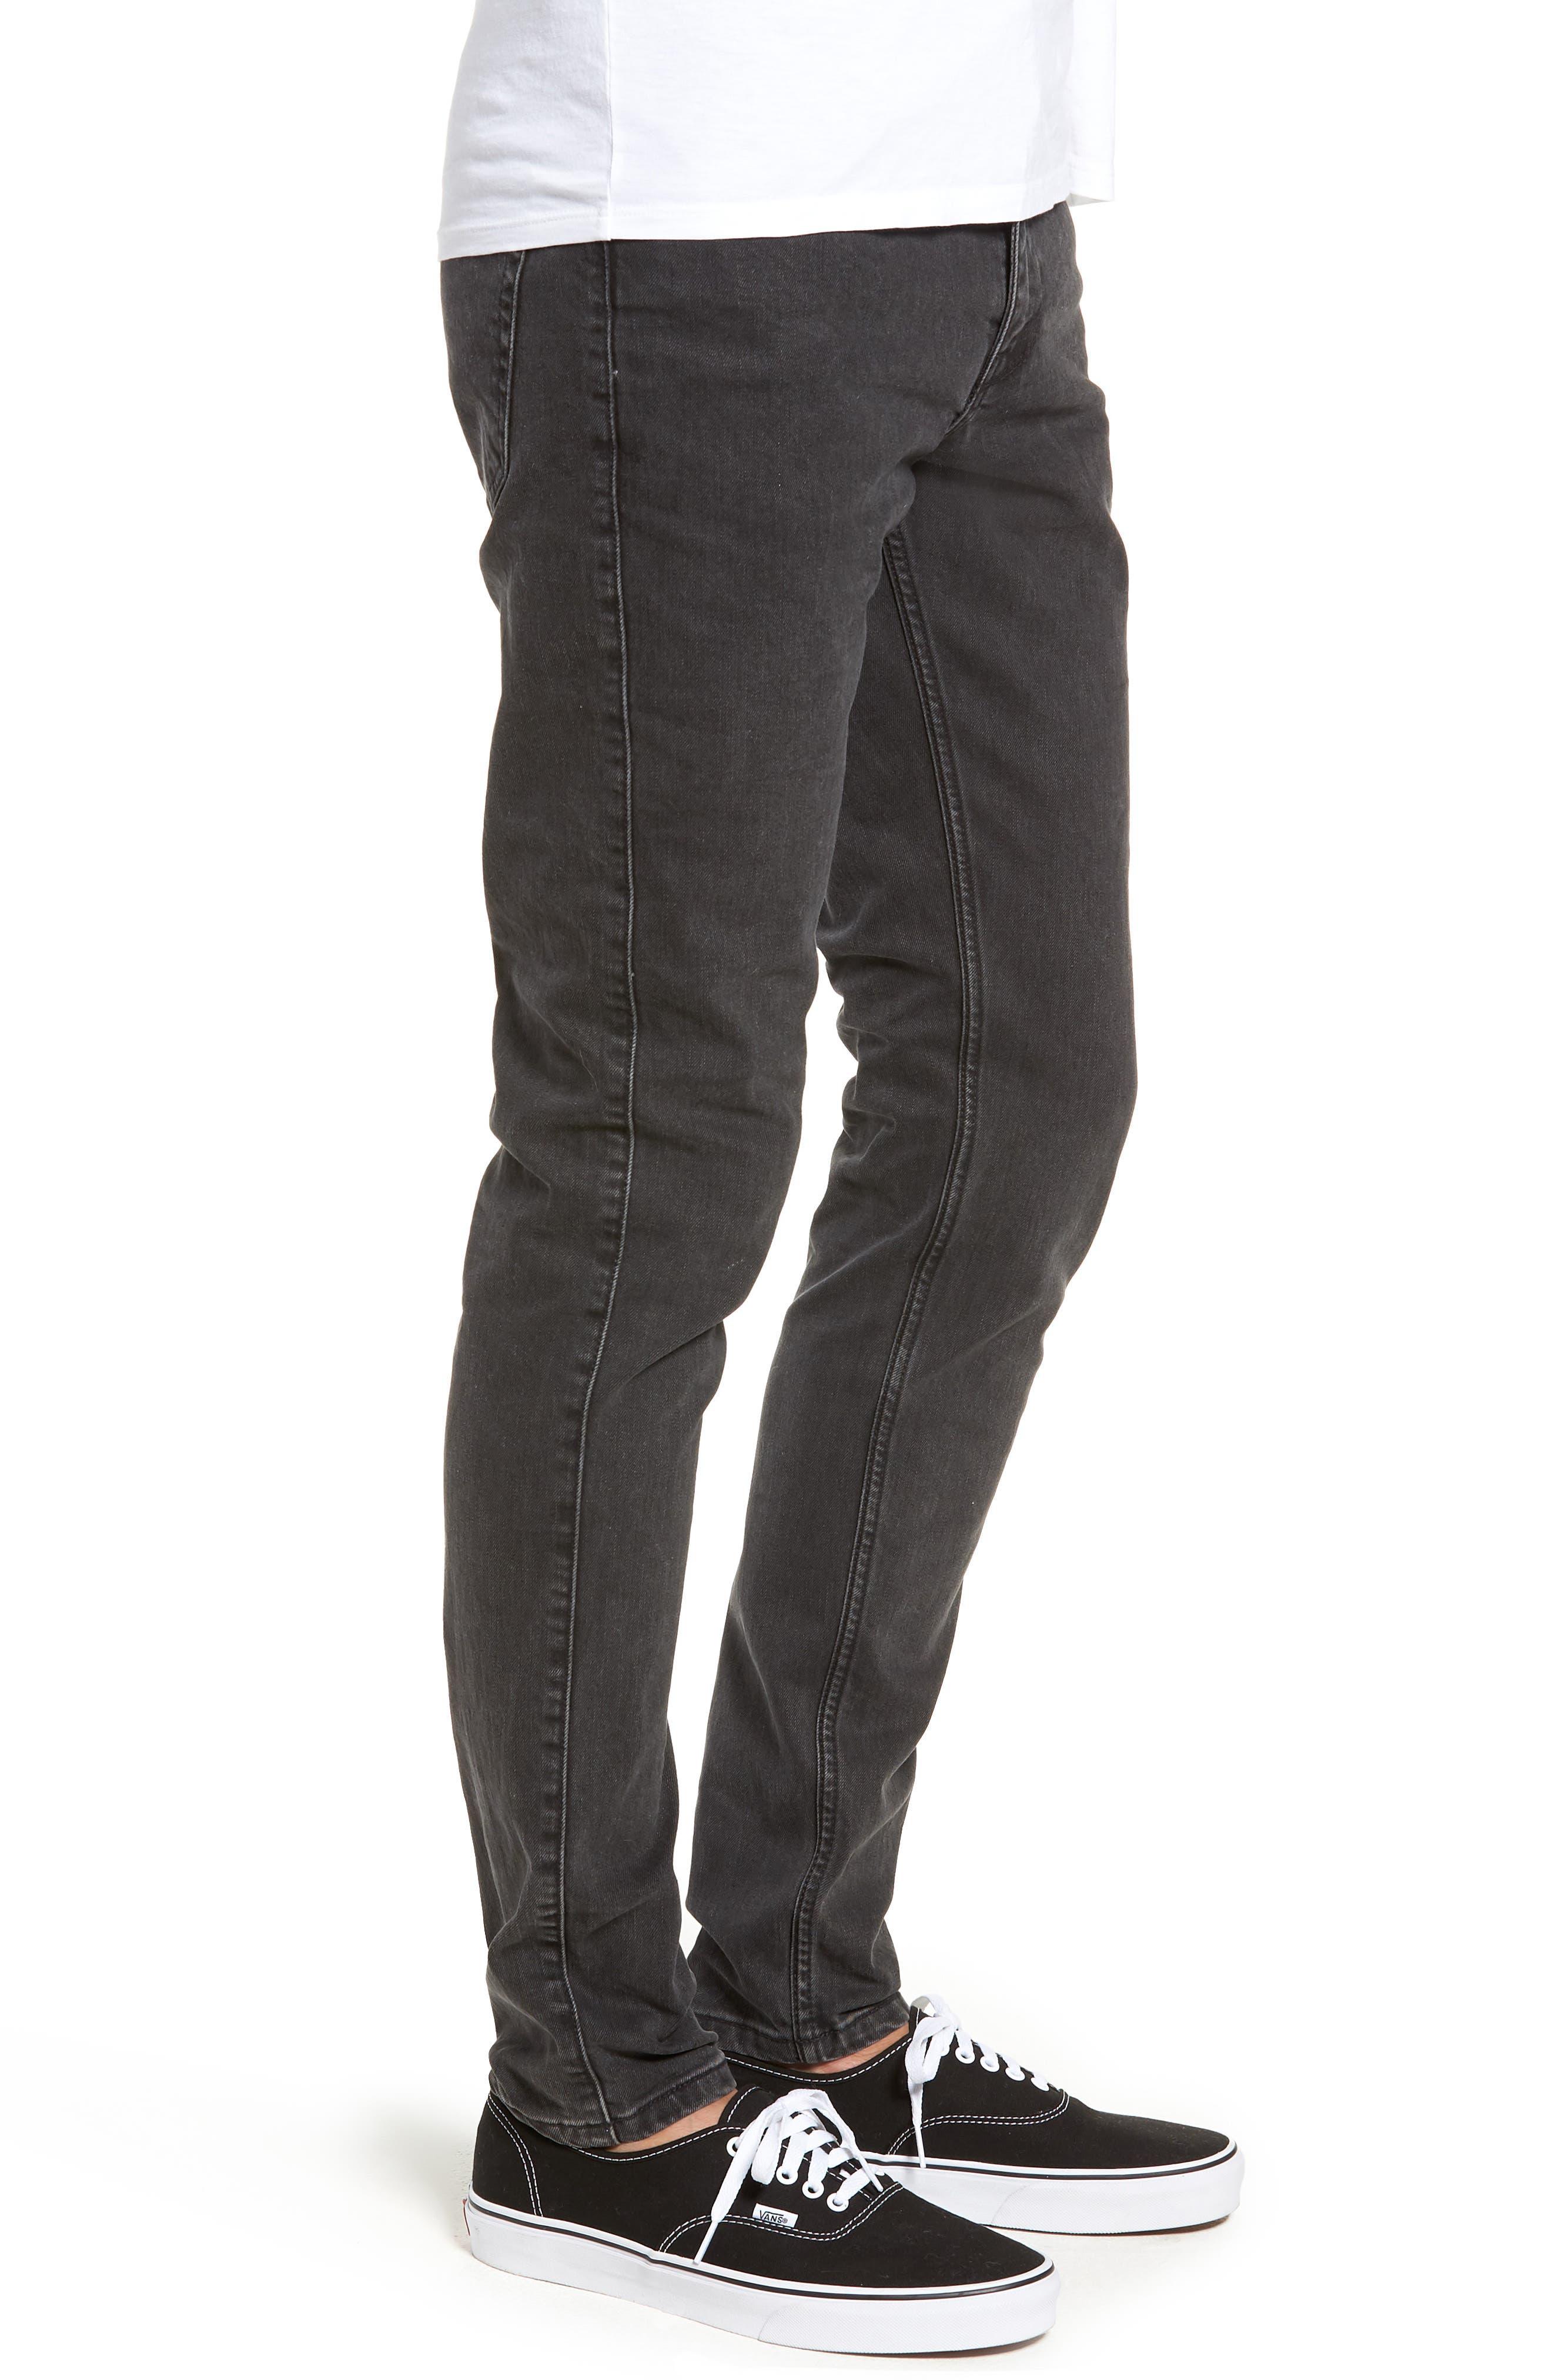 Clark Slim Straight Leg Jeans,                             Alternate thumbnail 3, color,                             Black Vintage